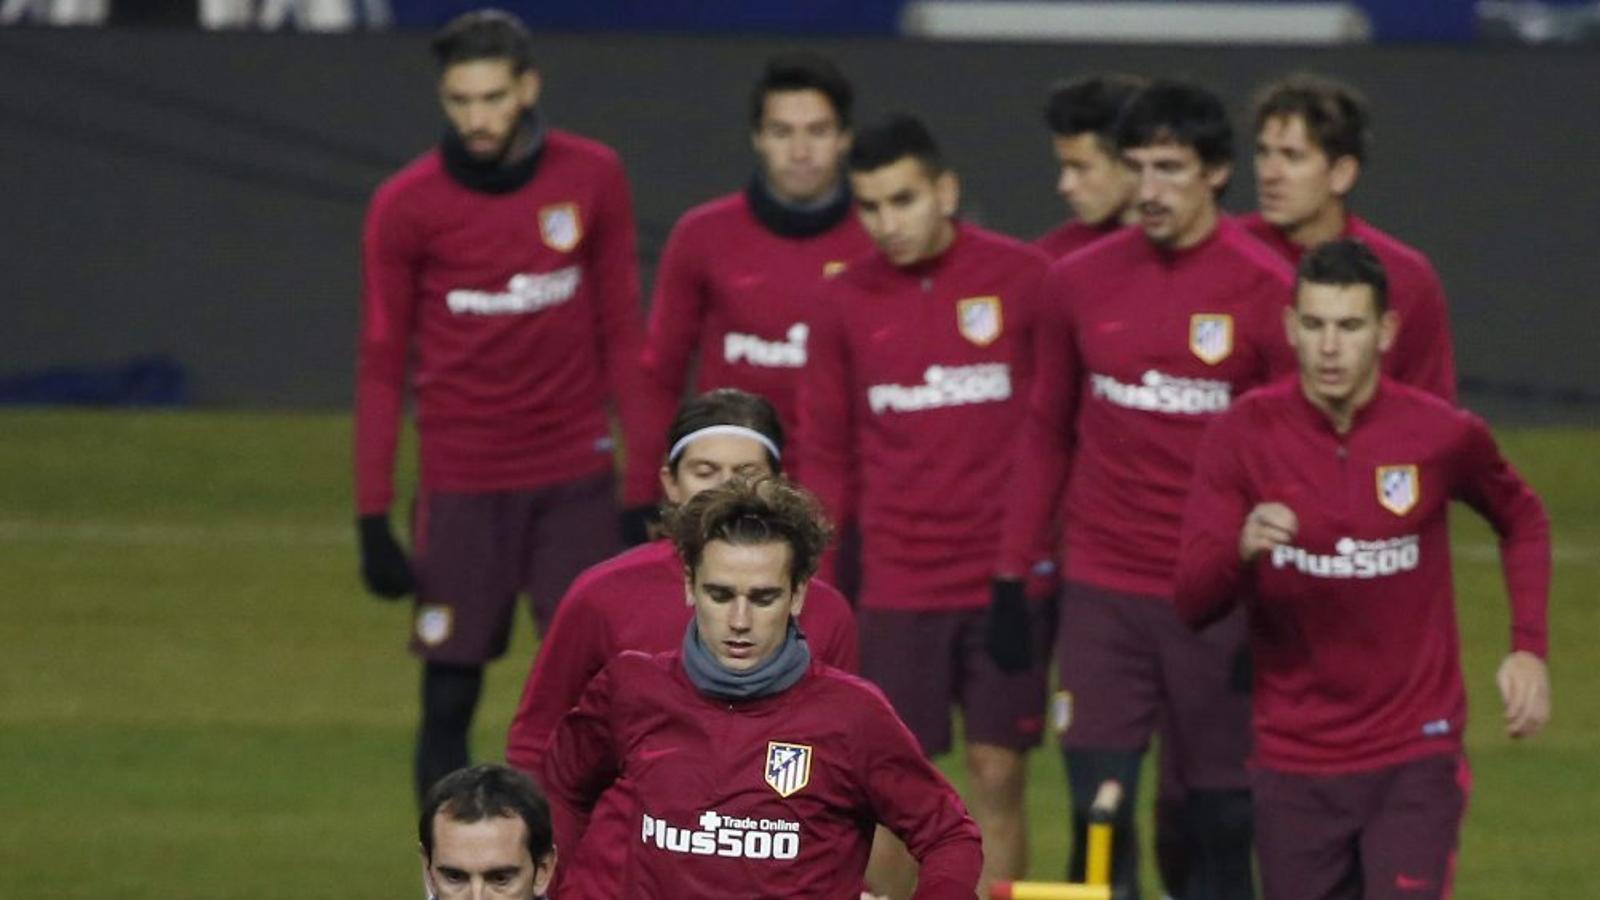 Madrid-entrenament-Vicente-Calderon-Barca 1734436581 36934875 651x366.jpg fff24968cbd